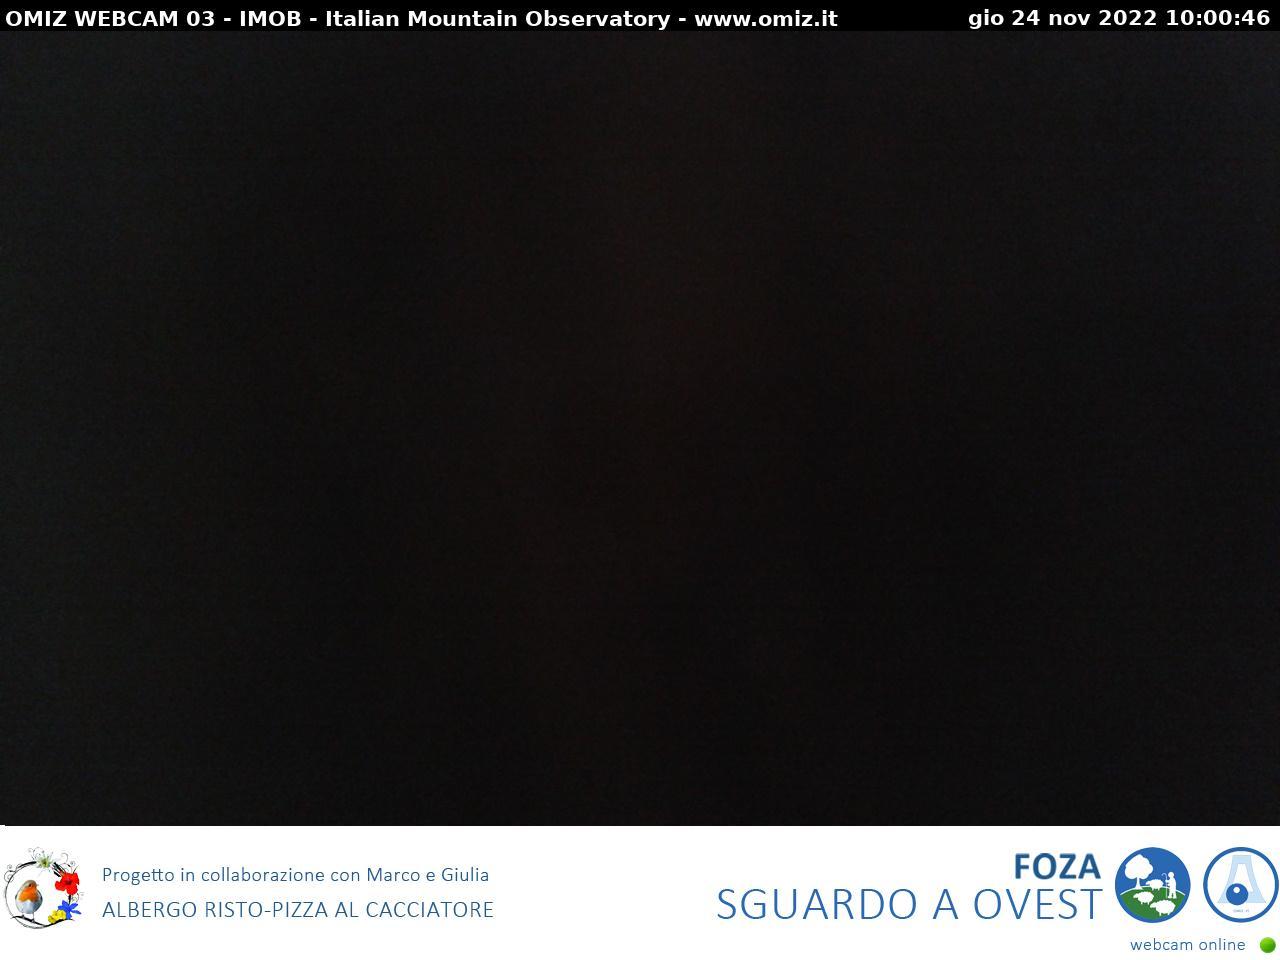 Livecam Foza 2